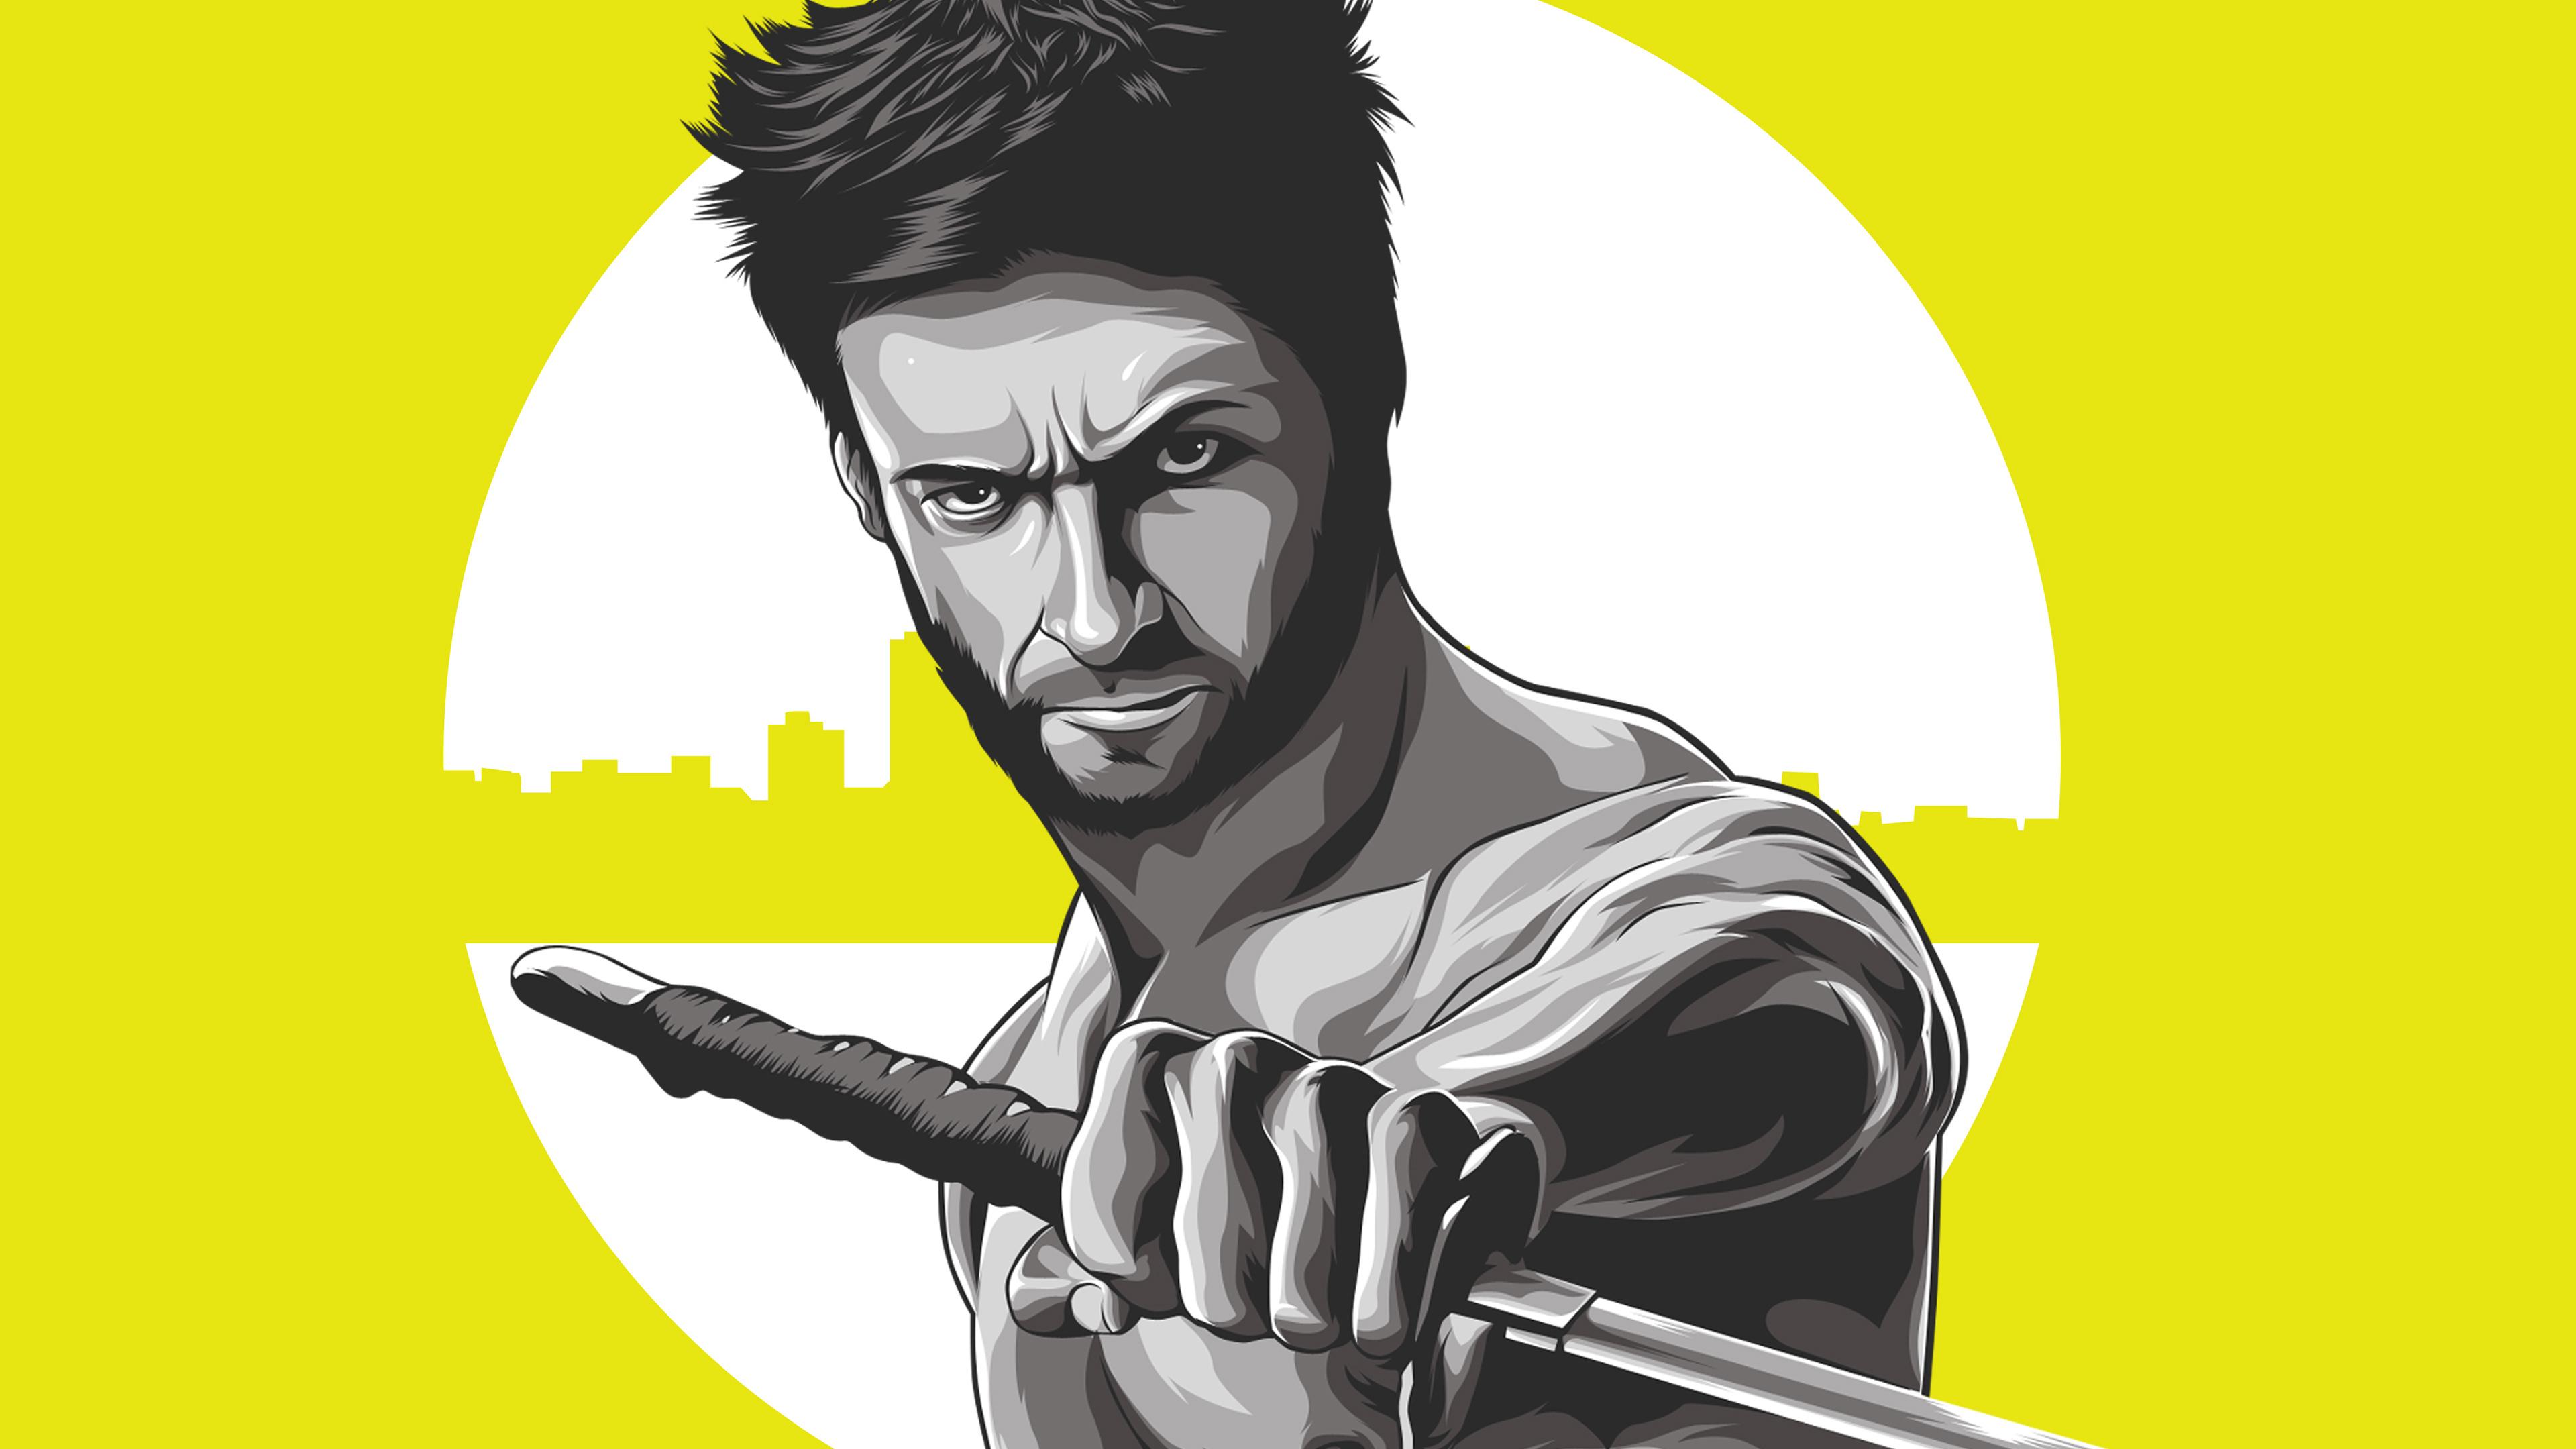 wolverine 4k illustration 1562106254 - Wolverine 4k Illustration - wolverine wallpapers, superheroes wallpapers, hd-wallpapers, artwork wallpapers, 4k-wallpapers